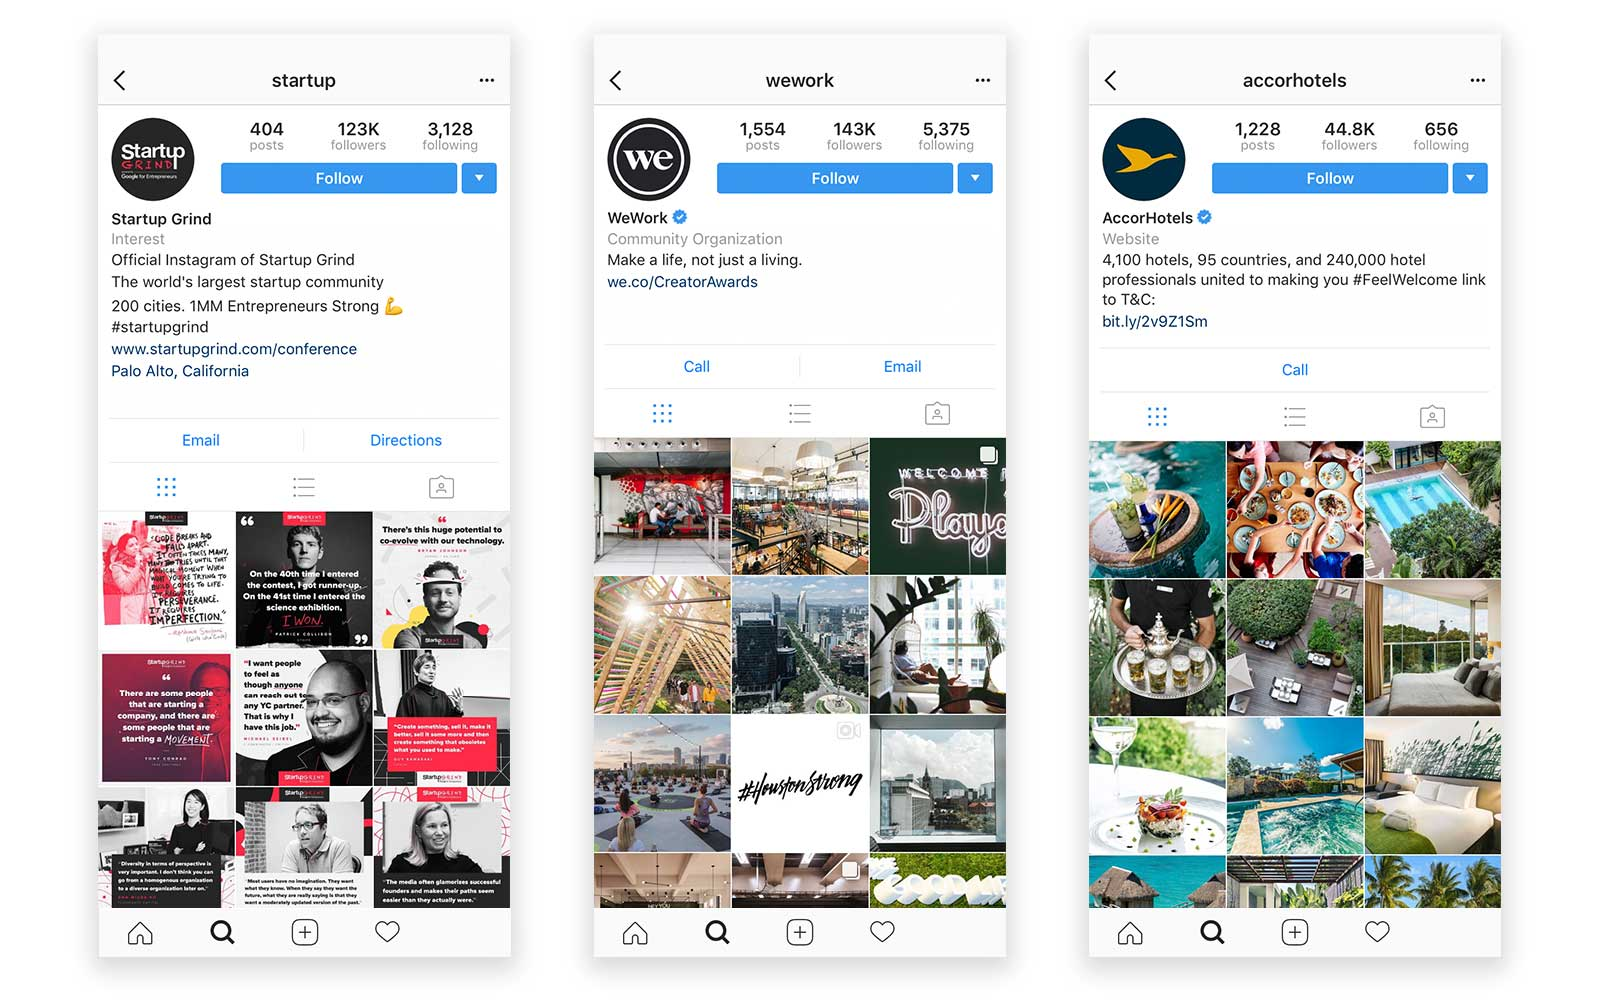 instagram accounts startupgrind wework accorhotels